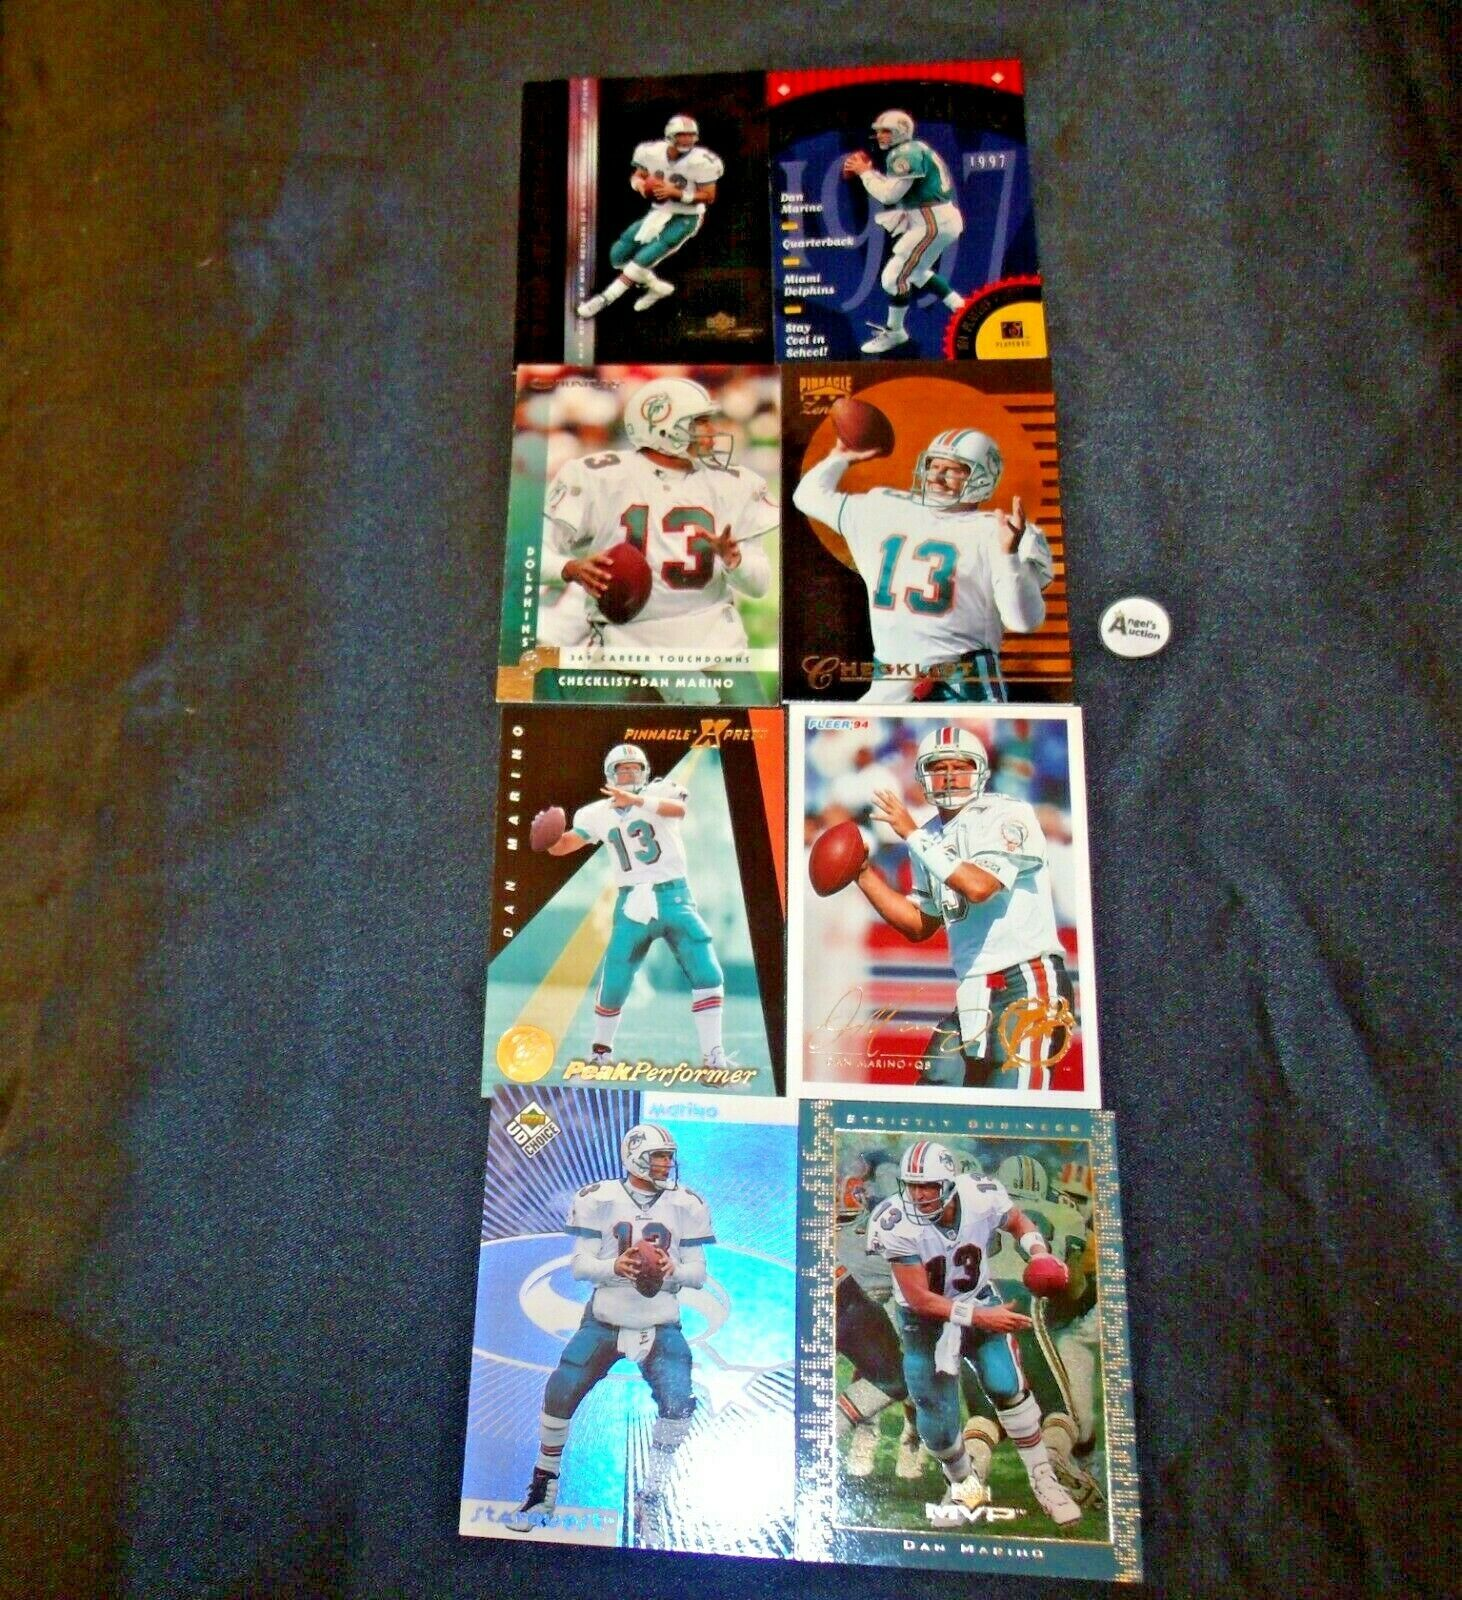 Dan Marino # 13 Miami Dolphins QB Football Trading Cards AA-19FTC3003 Vintage Co